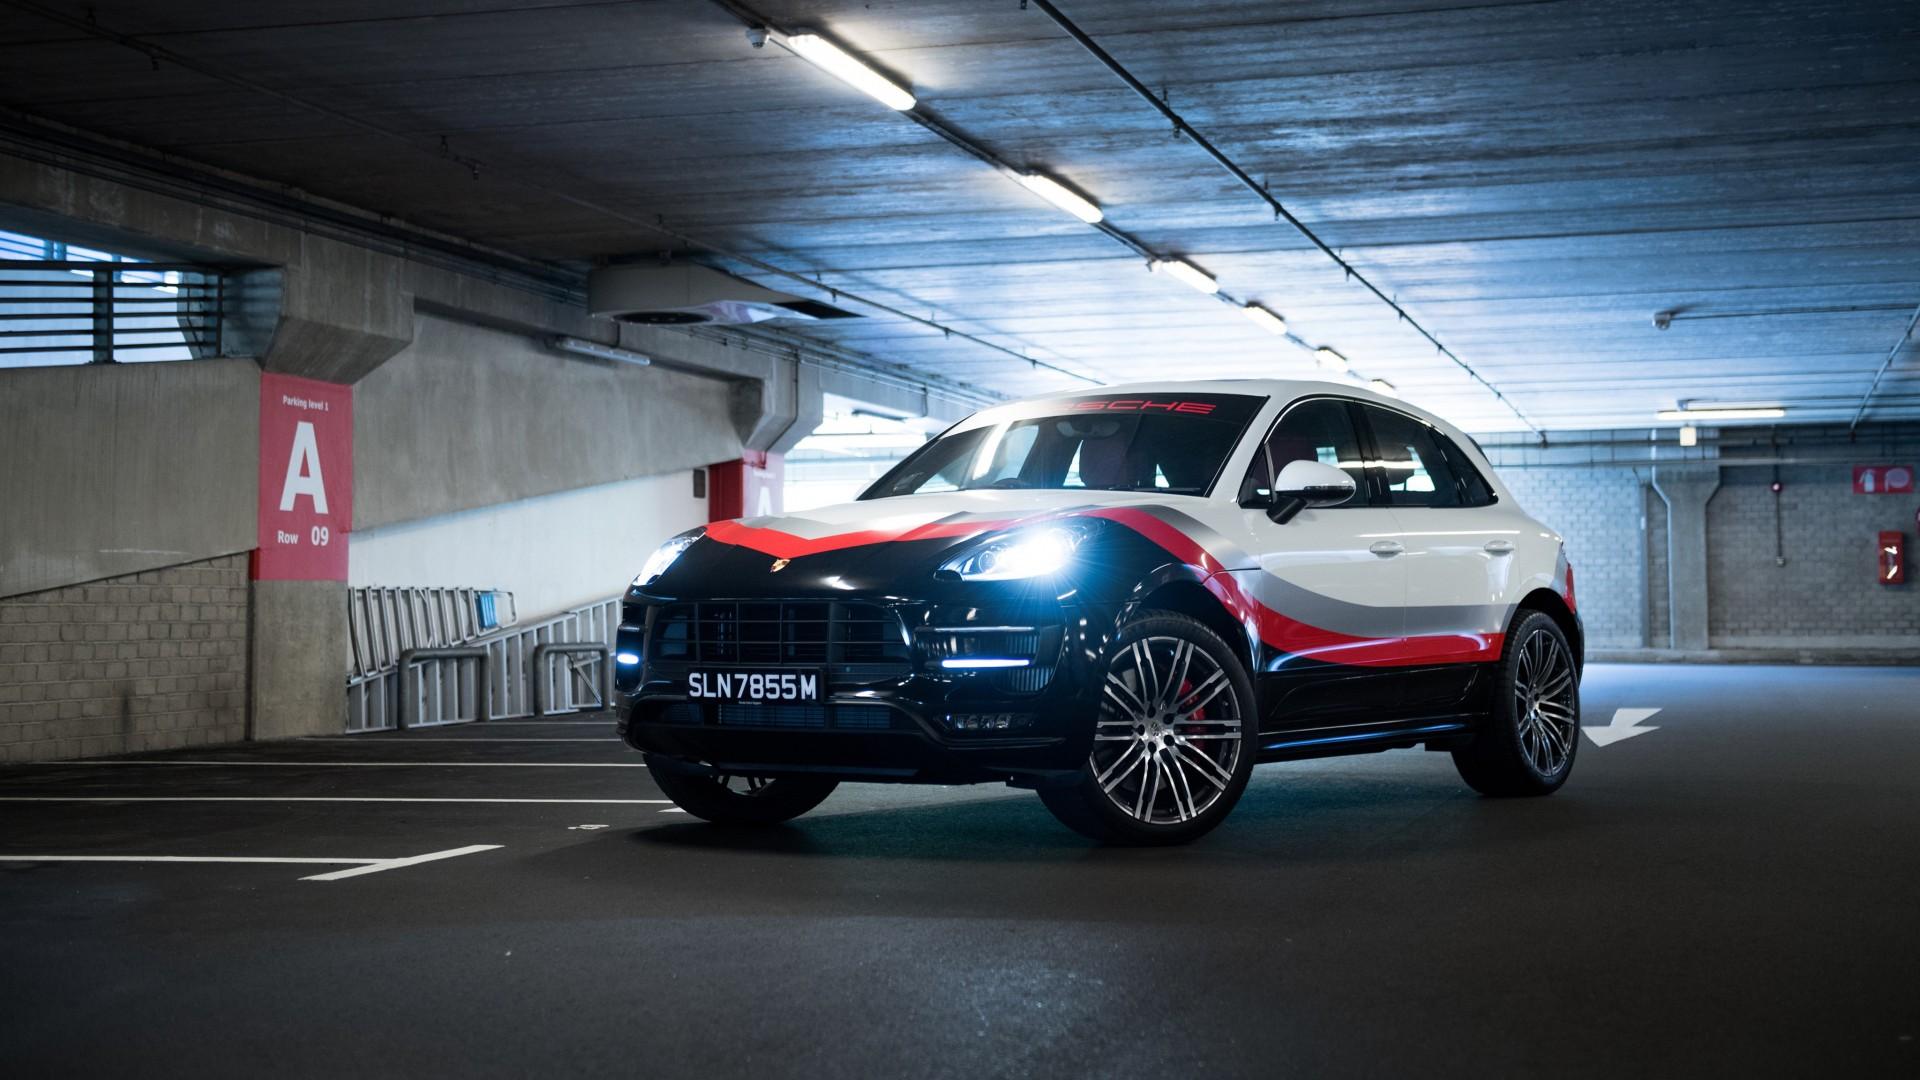 2017 Porsche Macan Turbo Performance Package 4K Wallpaper